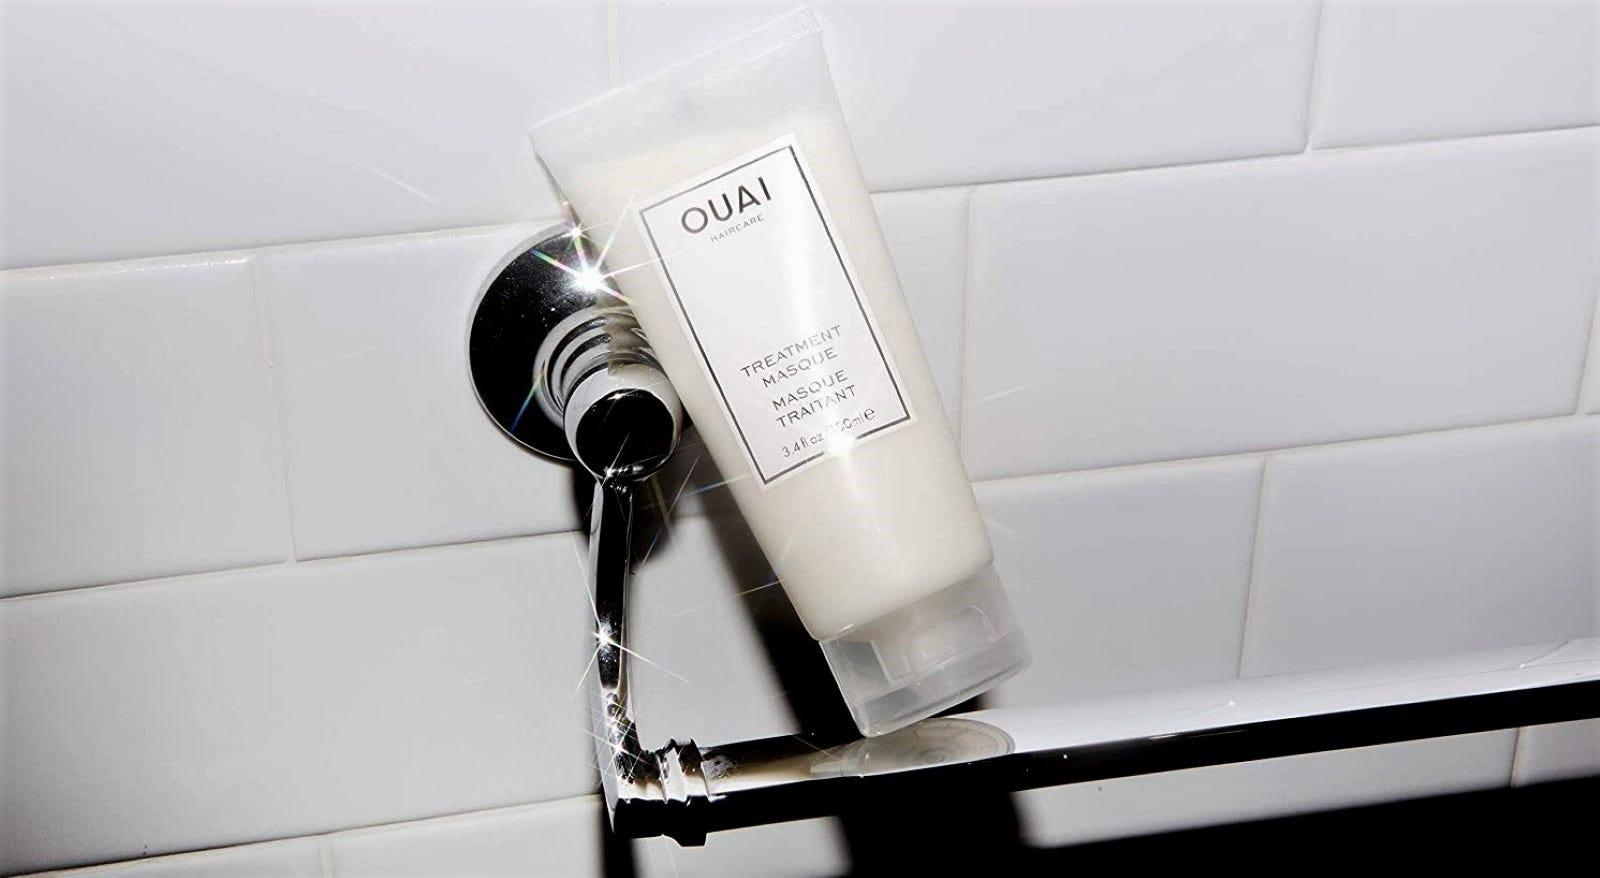 A tube of OUAI Treatment Mask sitting on a towel rack in a bathroom.